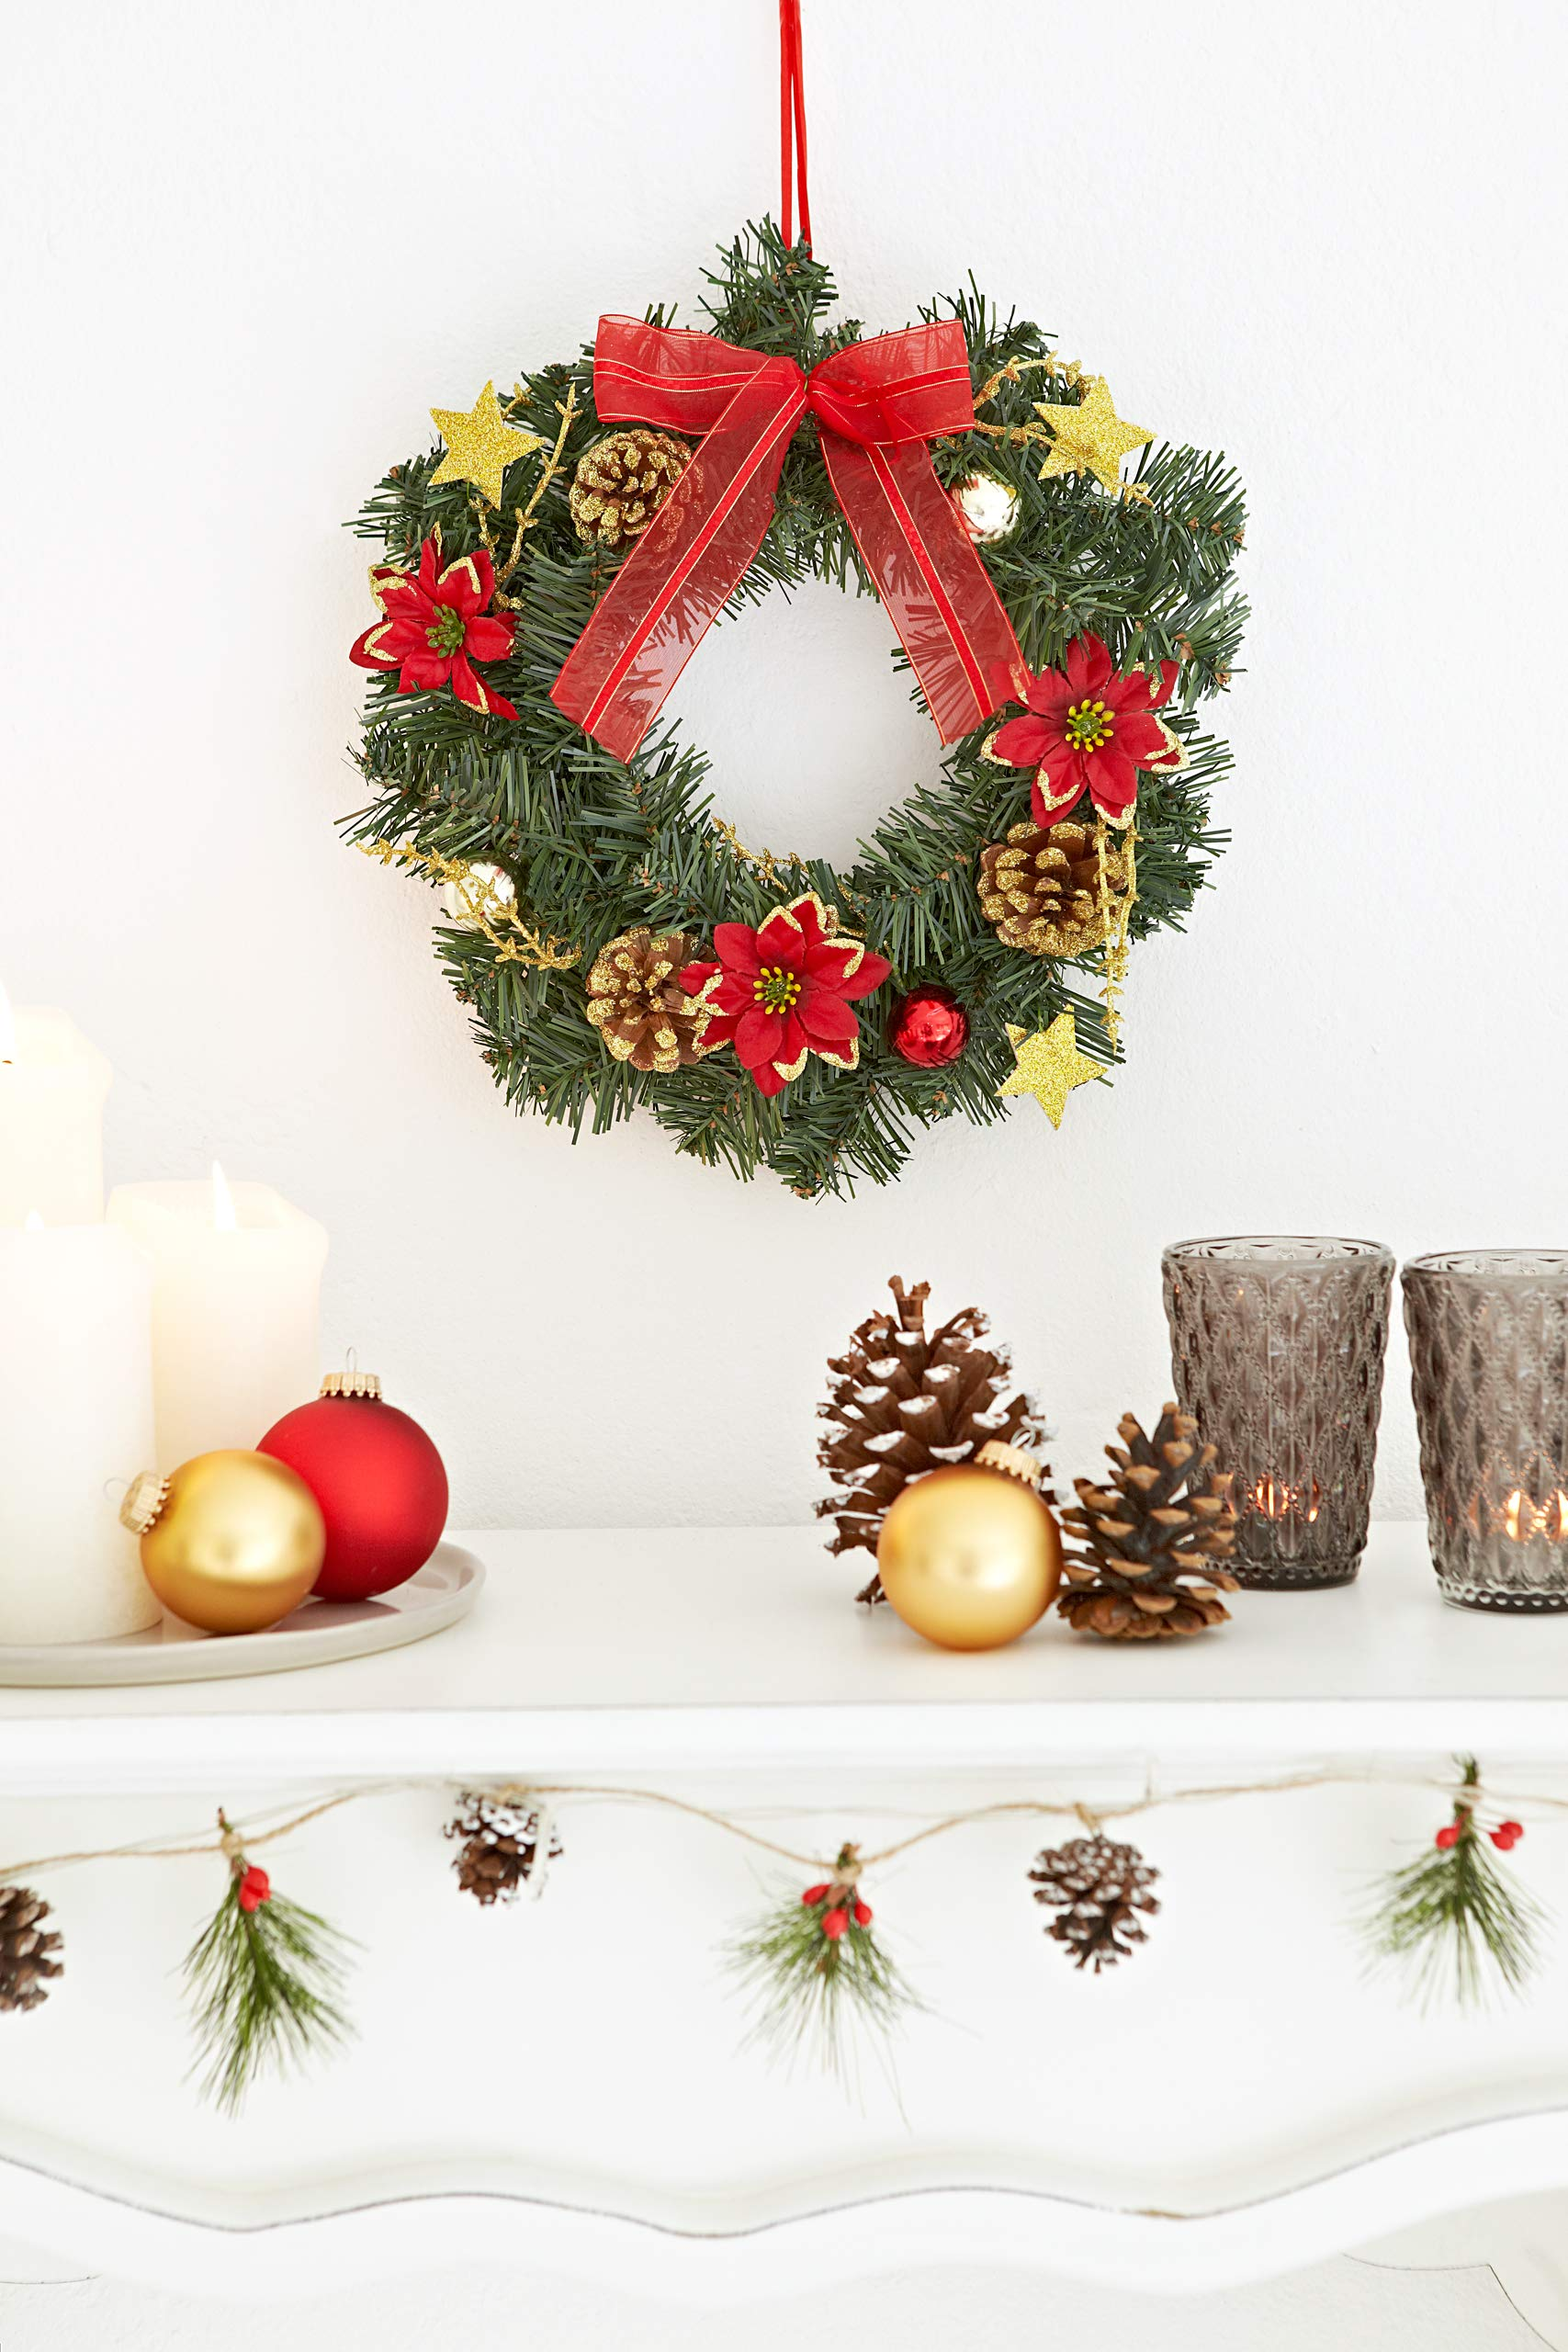 HEITMANN DECO Corona de Navidad Corona de Puerta de Navidad – Corona Decorativa de Ramas de Abeto